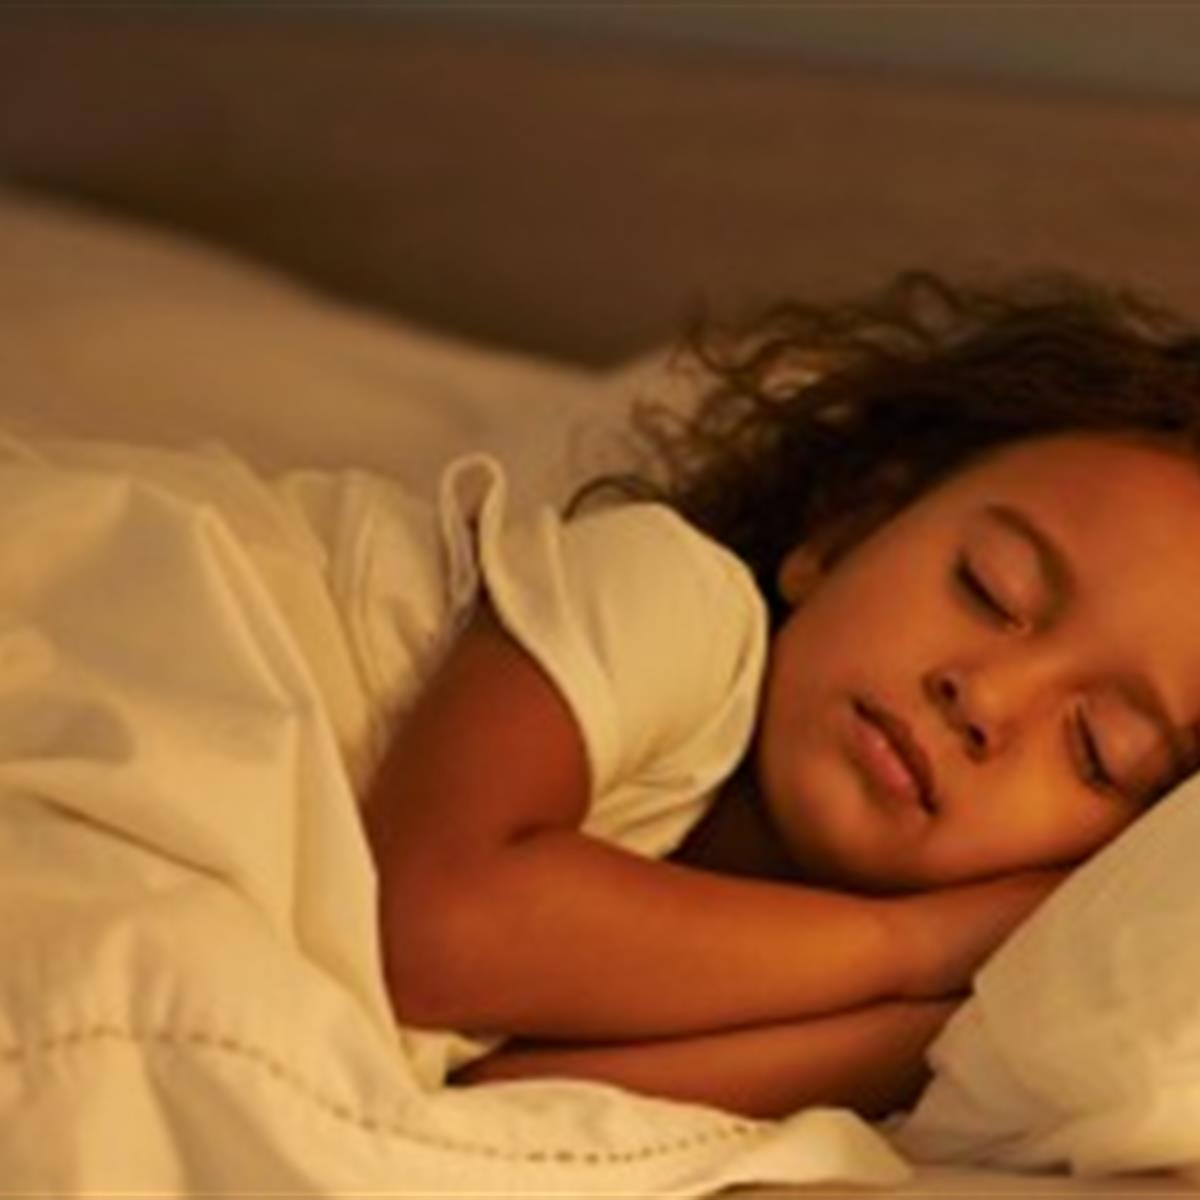 www.healthychildren.org